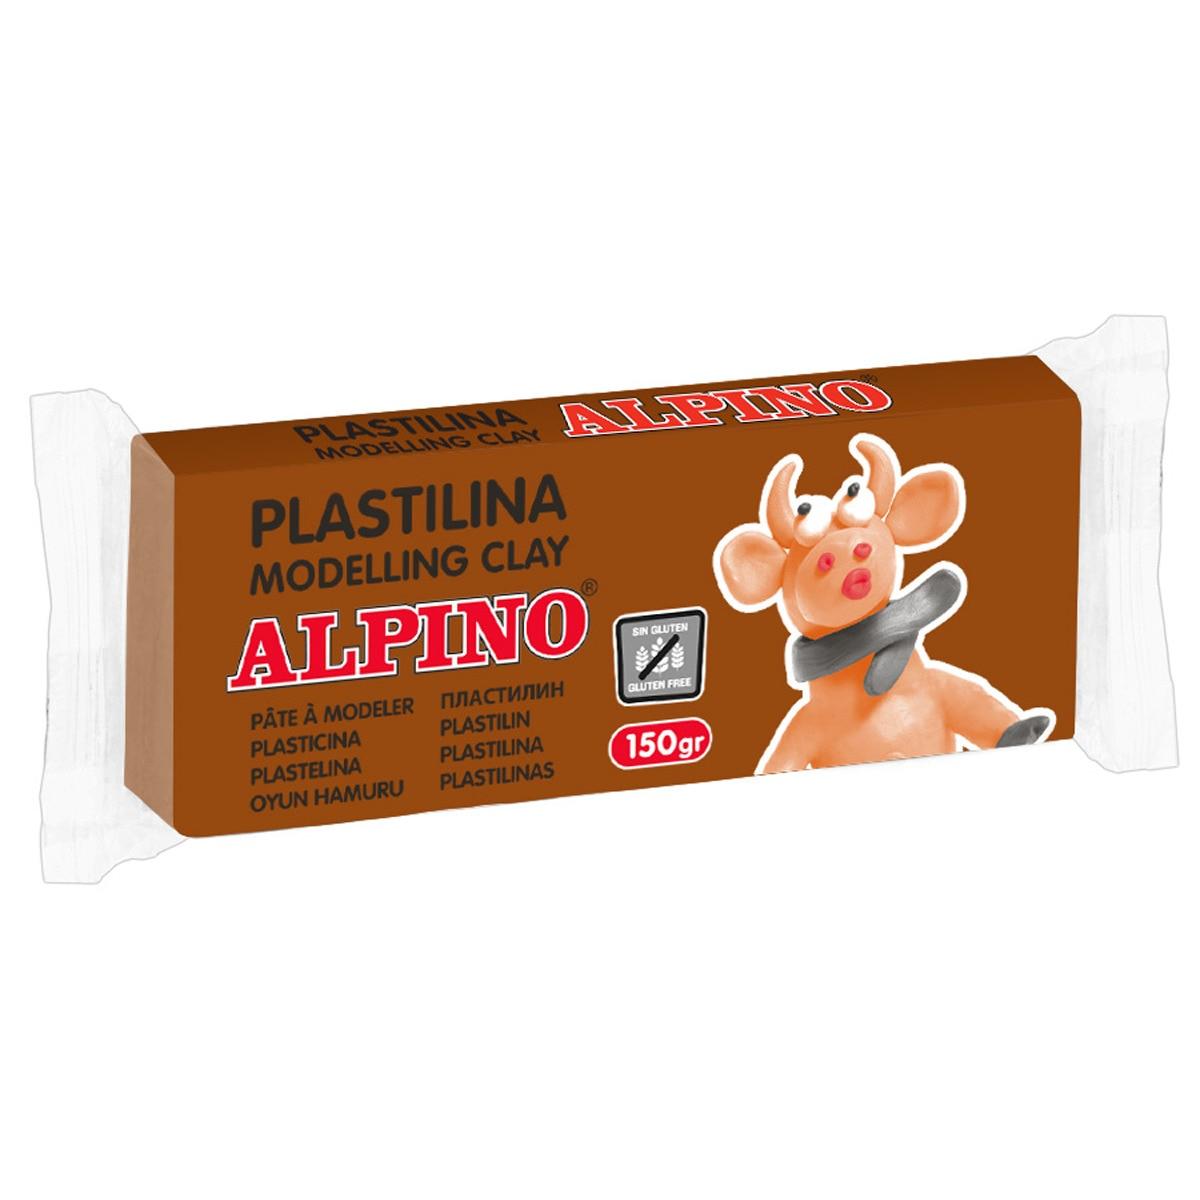 Plastilina Alpino 150g 2 unidades (-70% 2ª unidad)